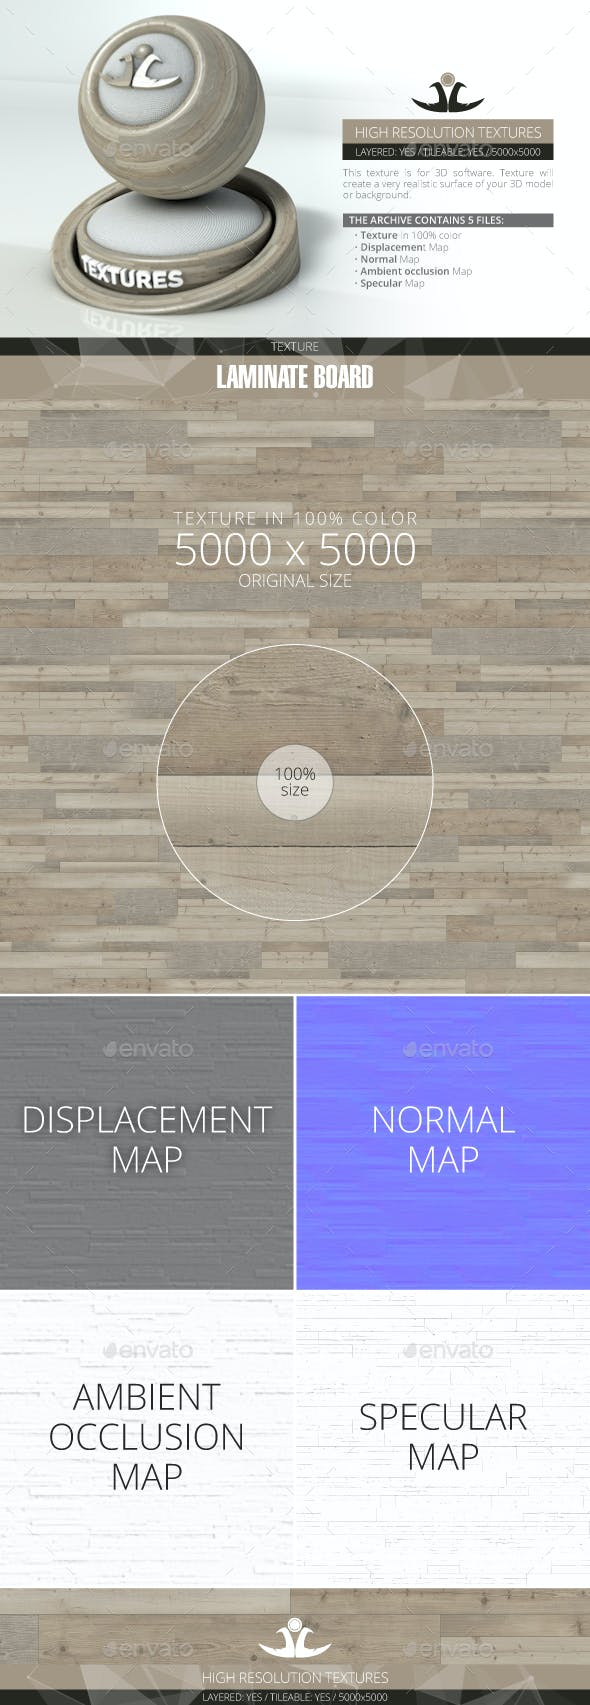 Laminate Board 36 - 3DOcean Item for Sale